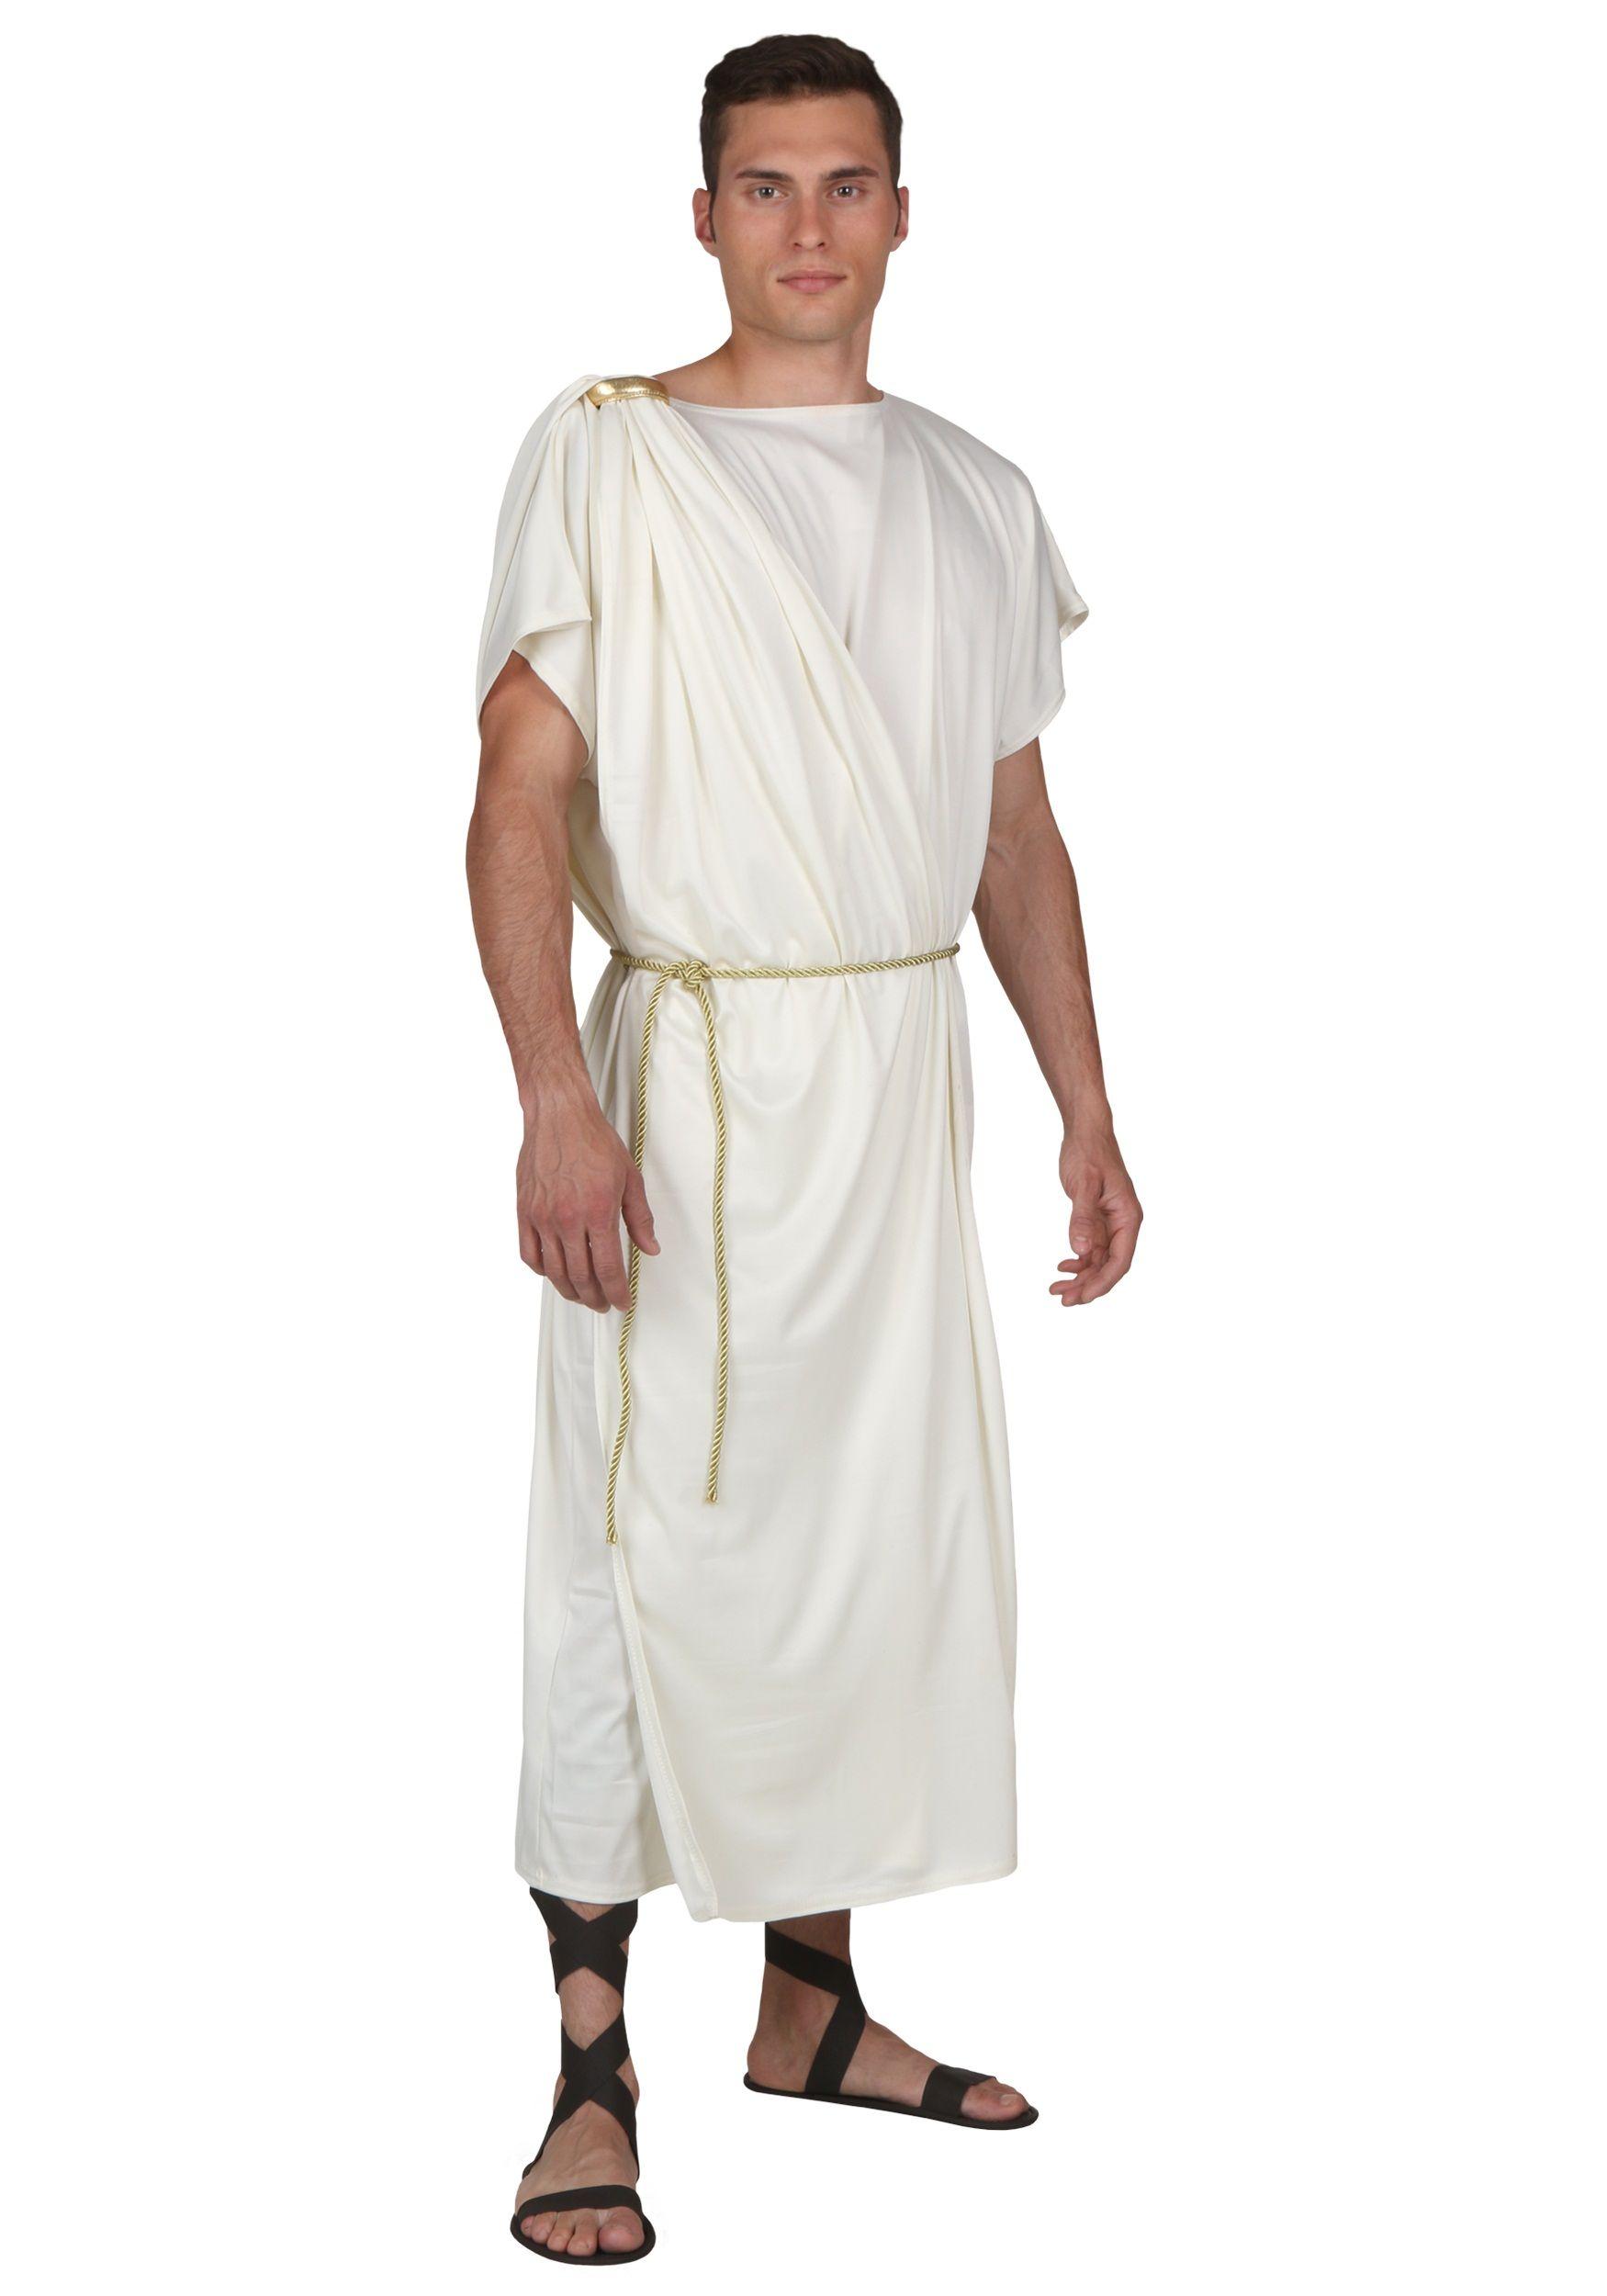 toga - Recherche Google | Costume - Greece and Ancient Rome | Pinterest